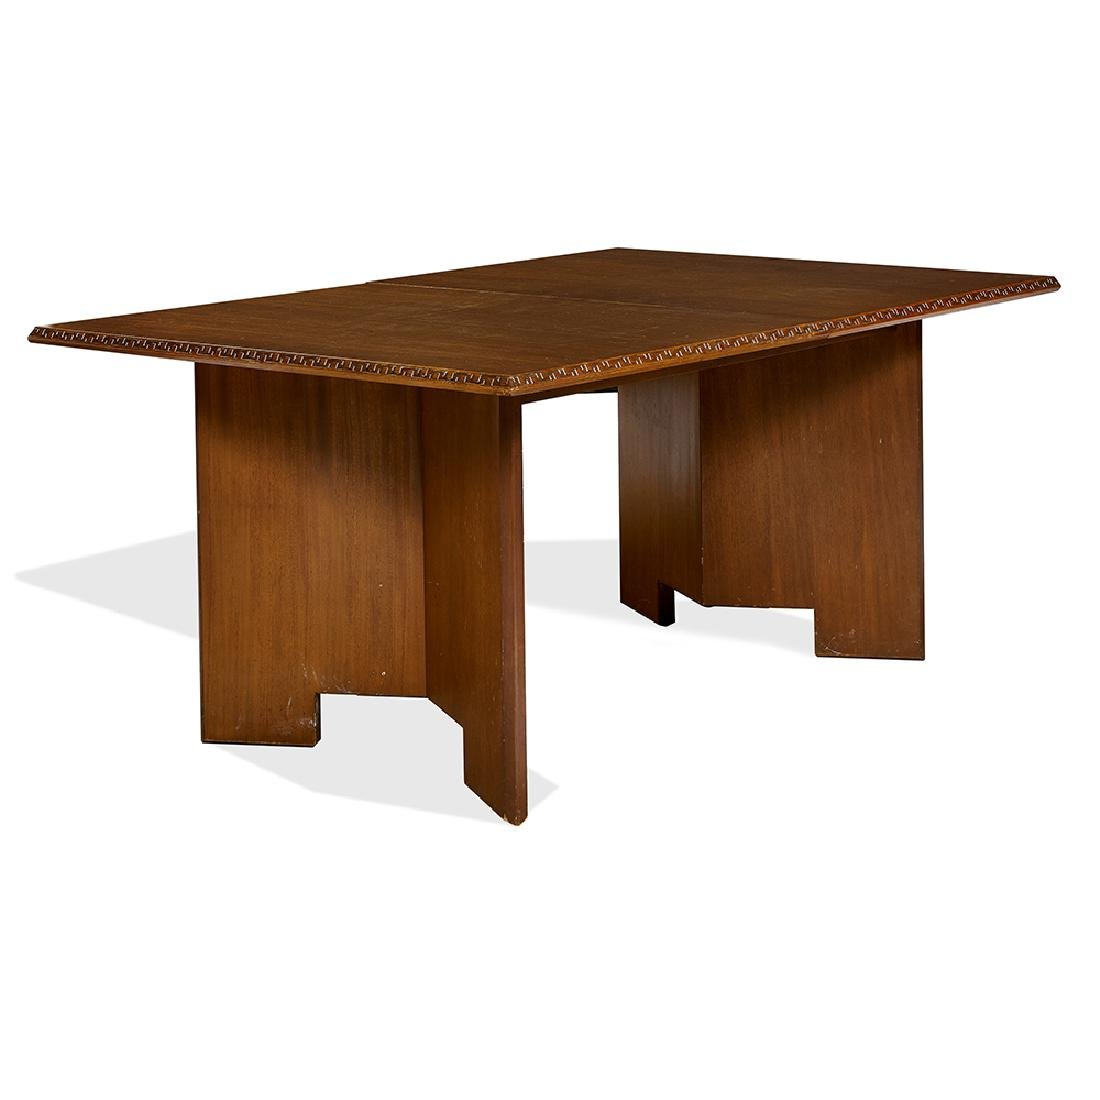 Frank Lloyd Wright / Henredon dining table